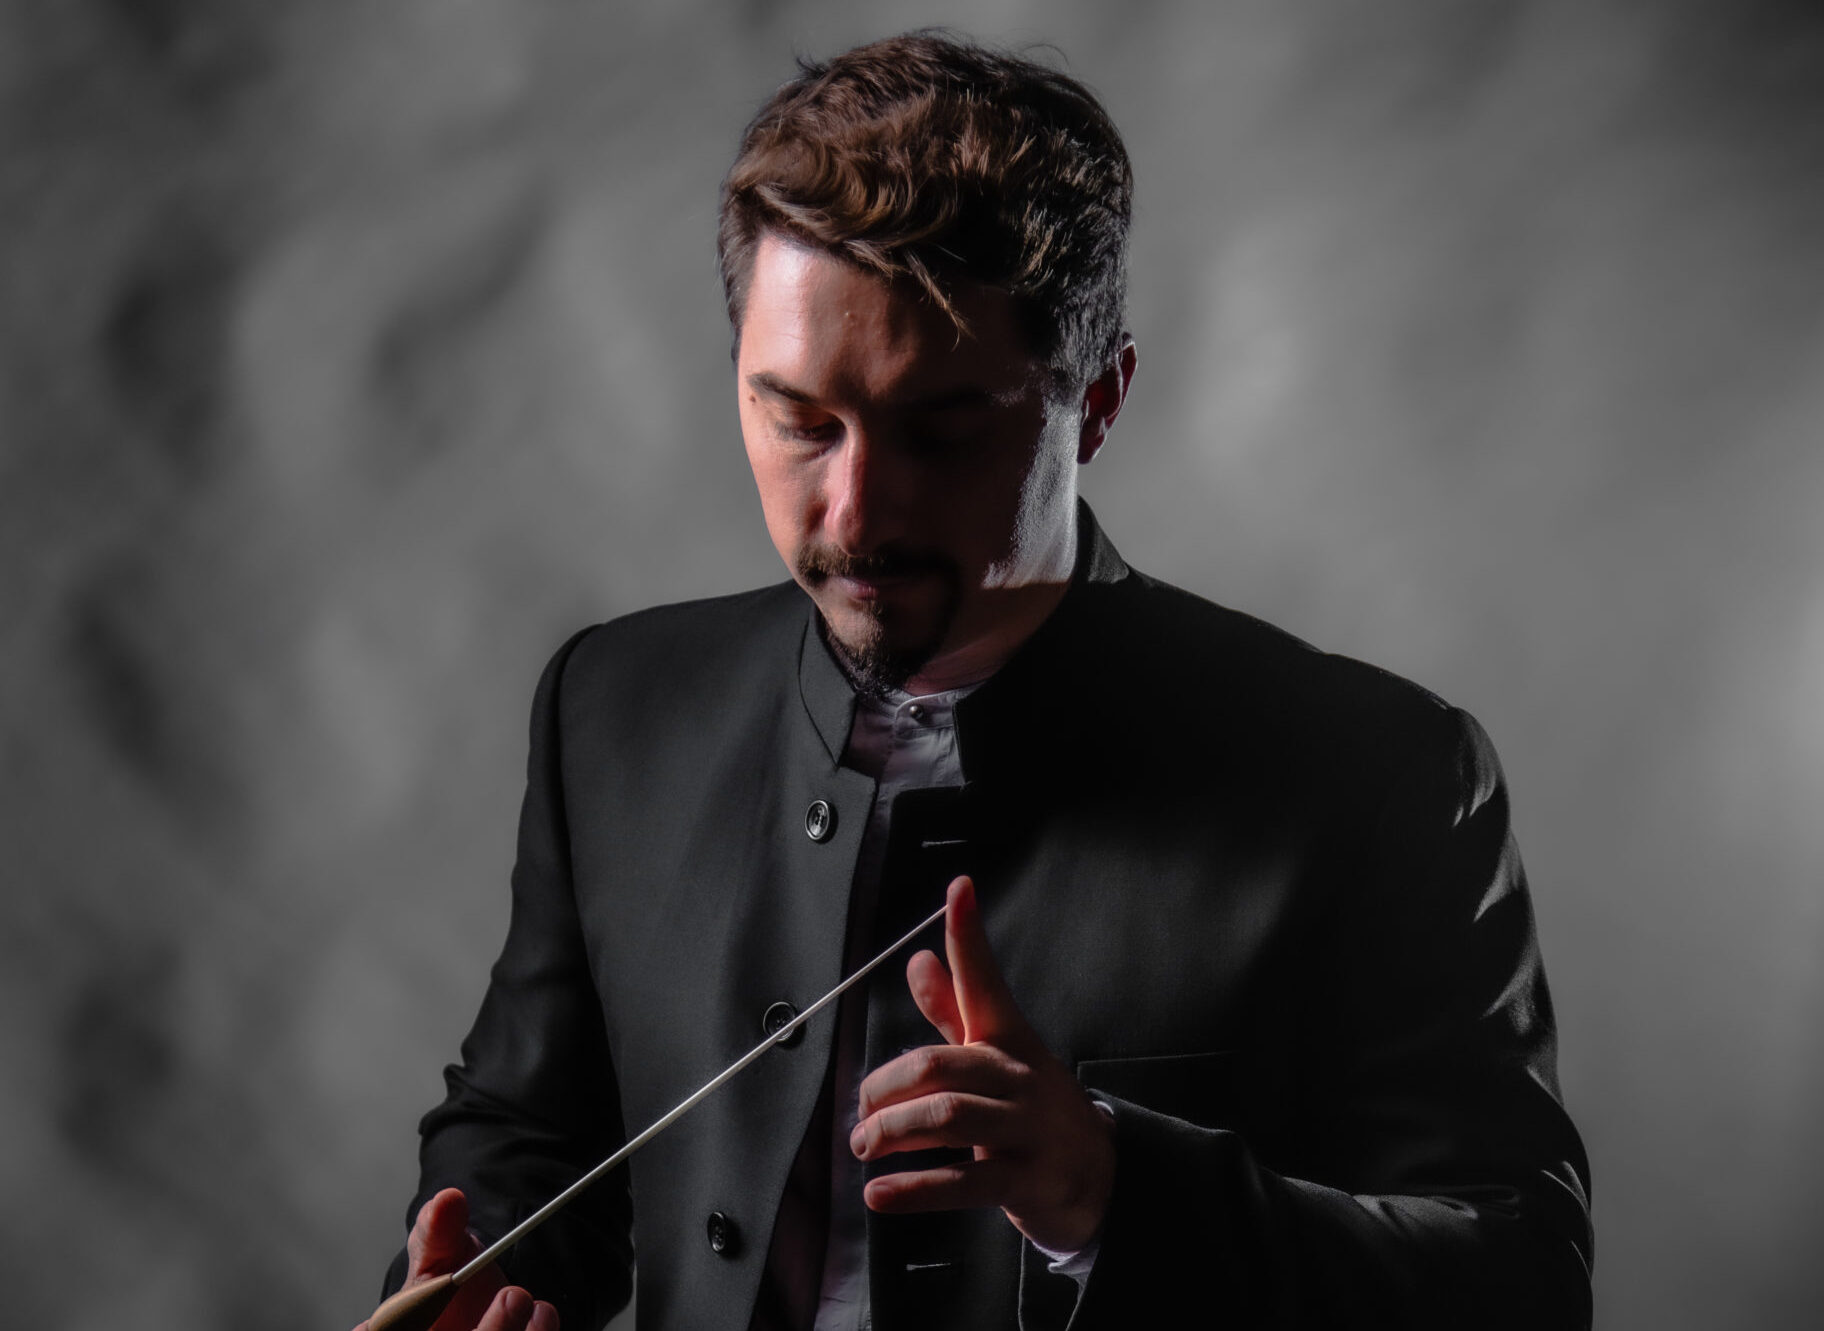 musician-1